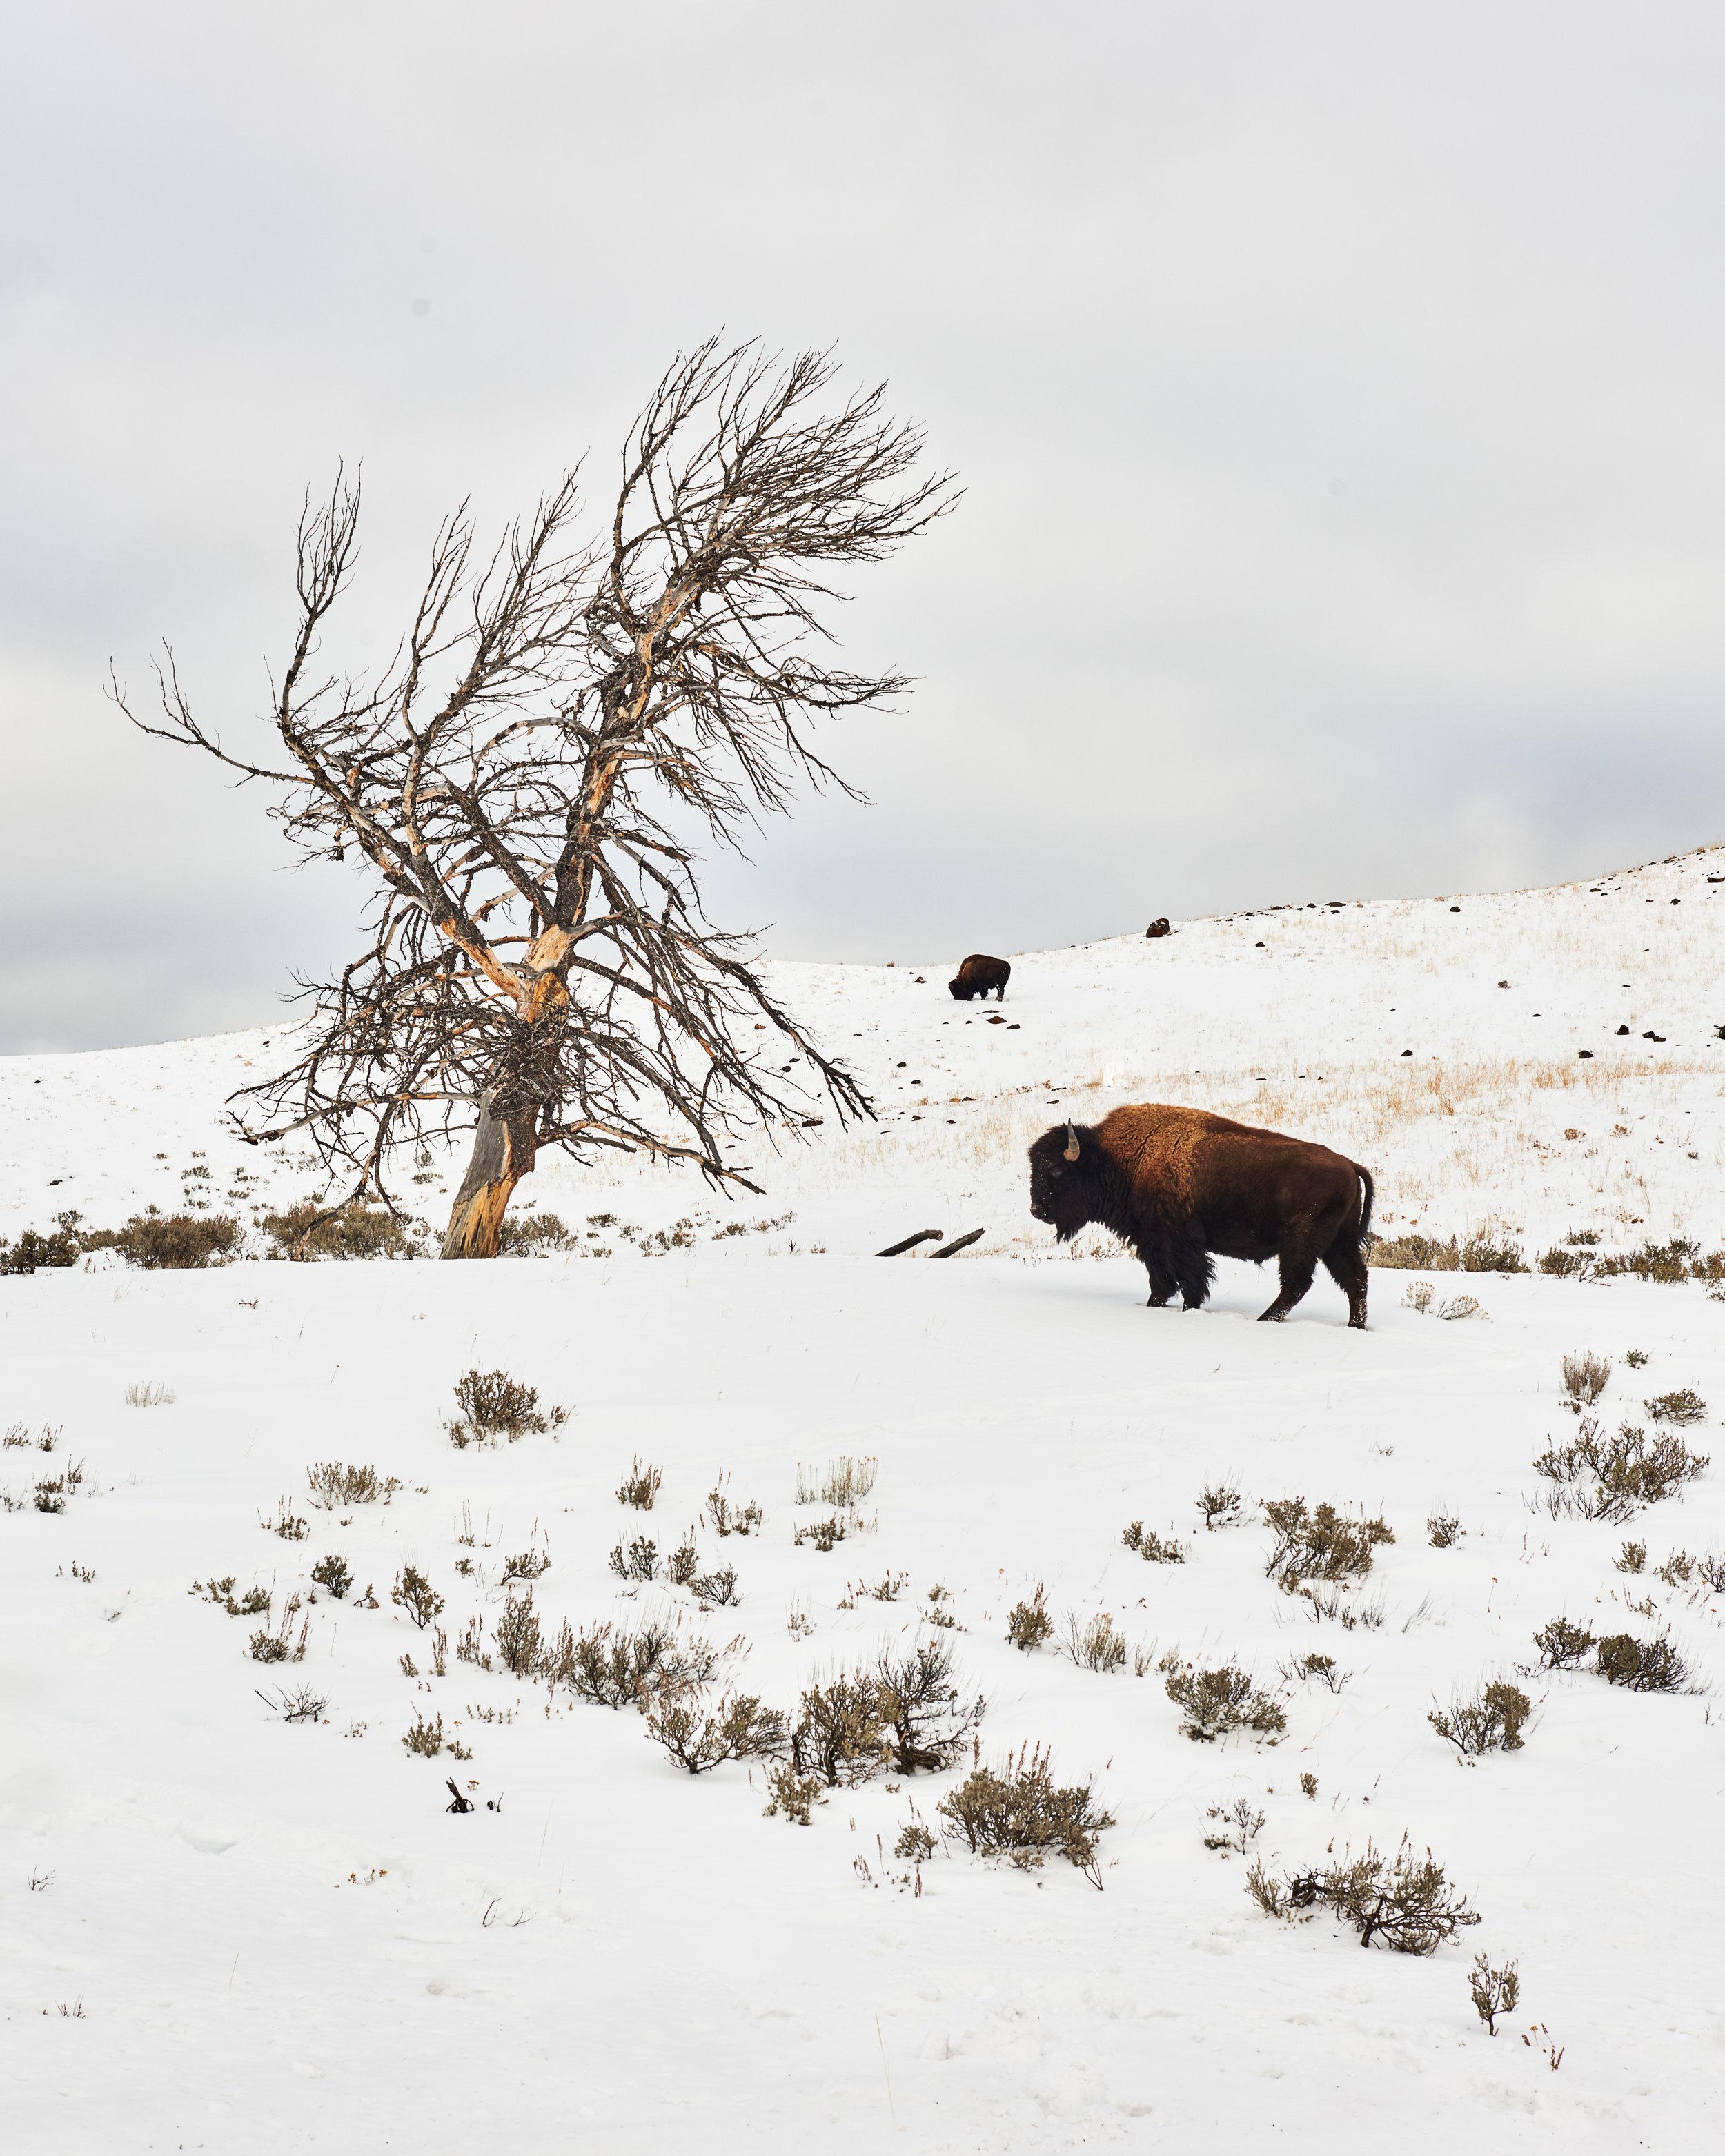 Bison & Tree